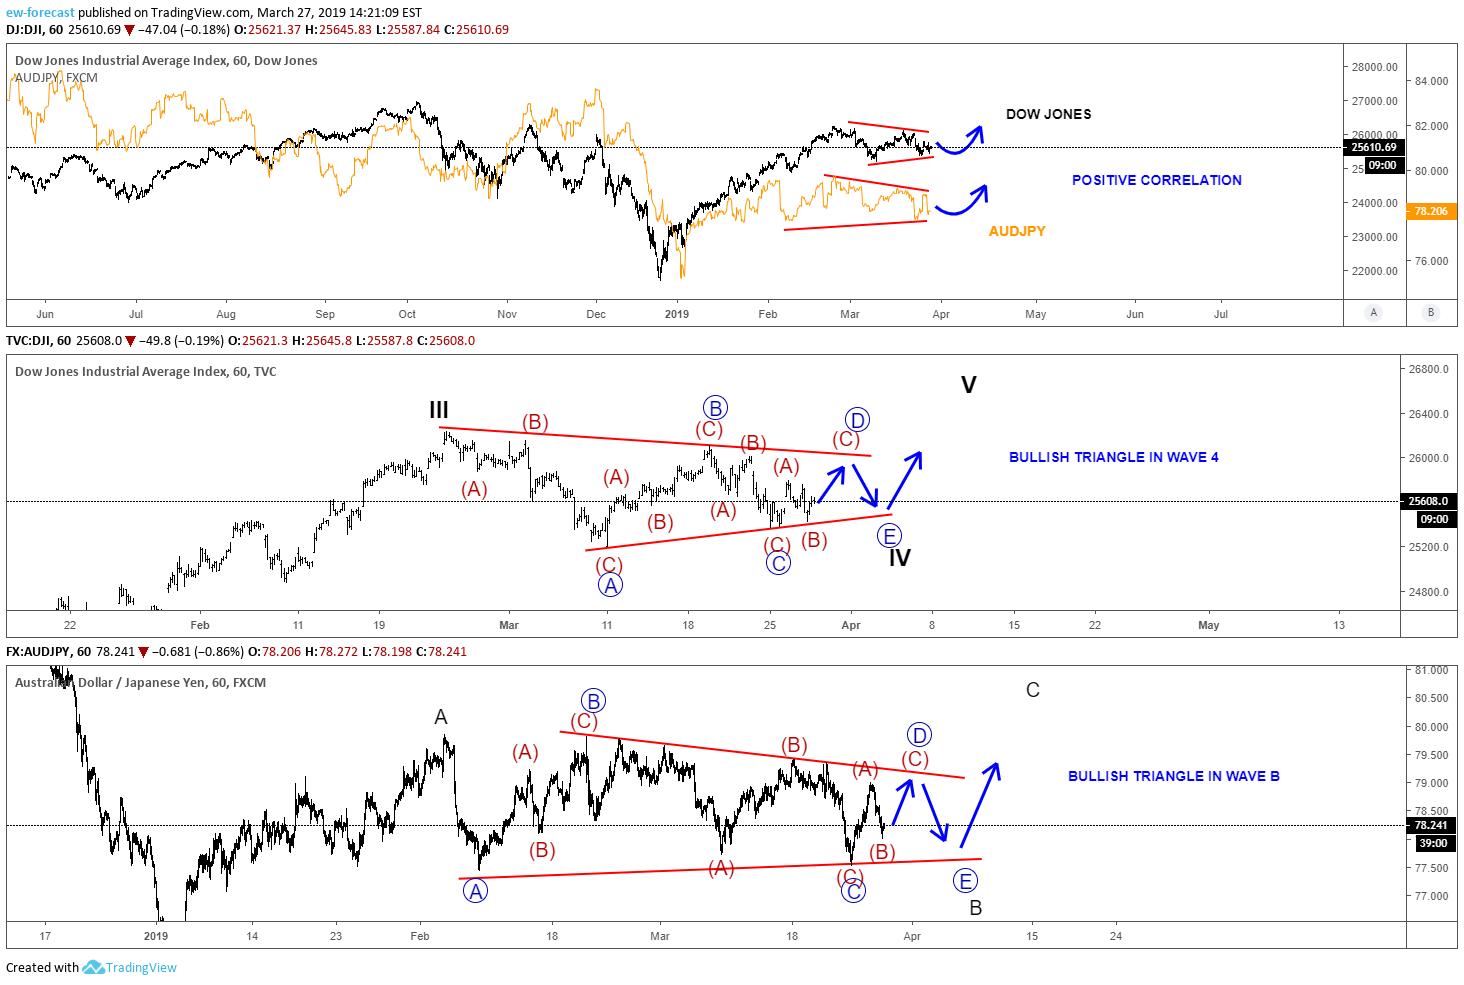 Elliott Wave & Intermarket Analysis For DOW JONES And AUDJPY